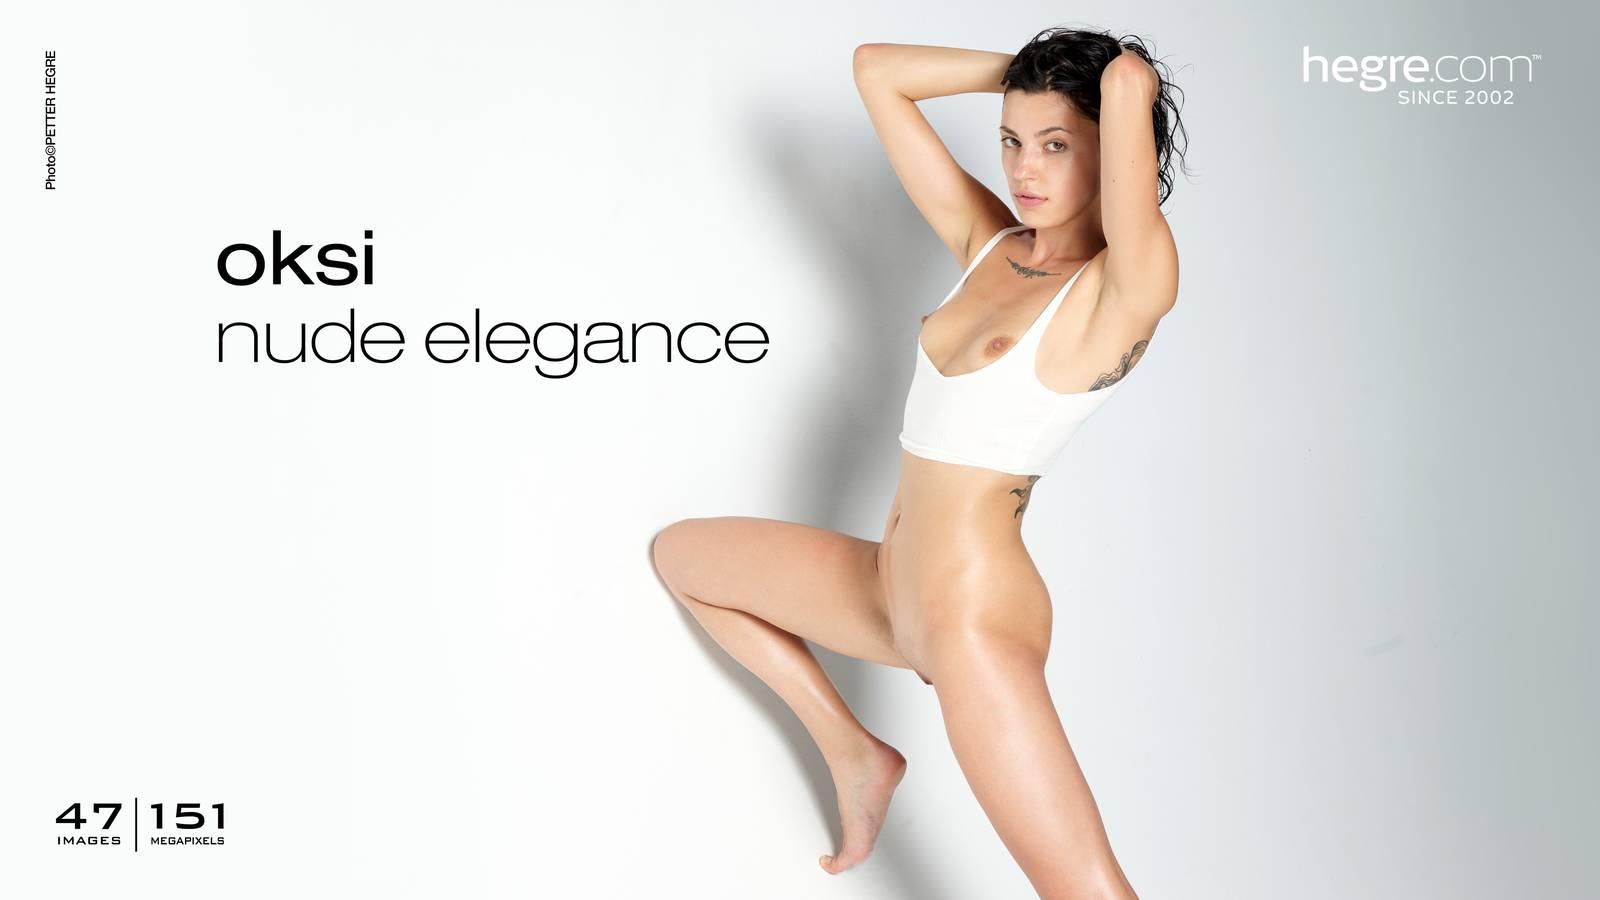 libanesische modell nude